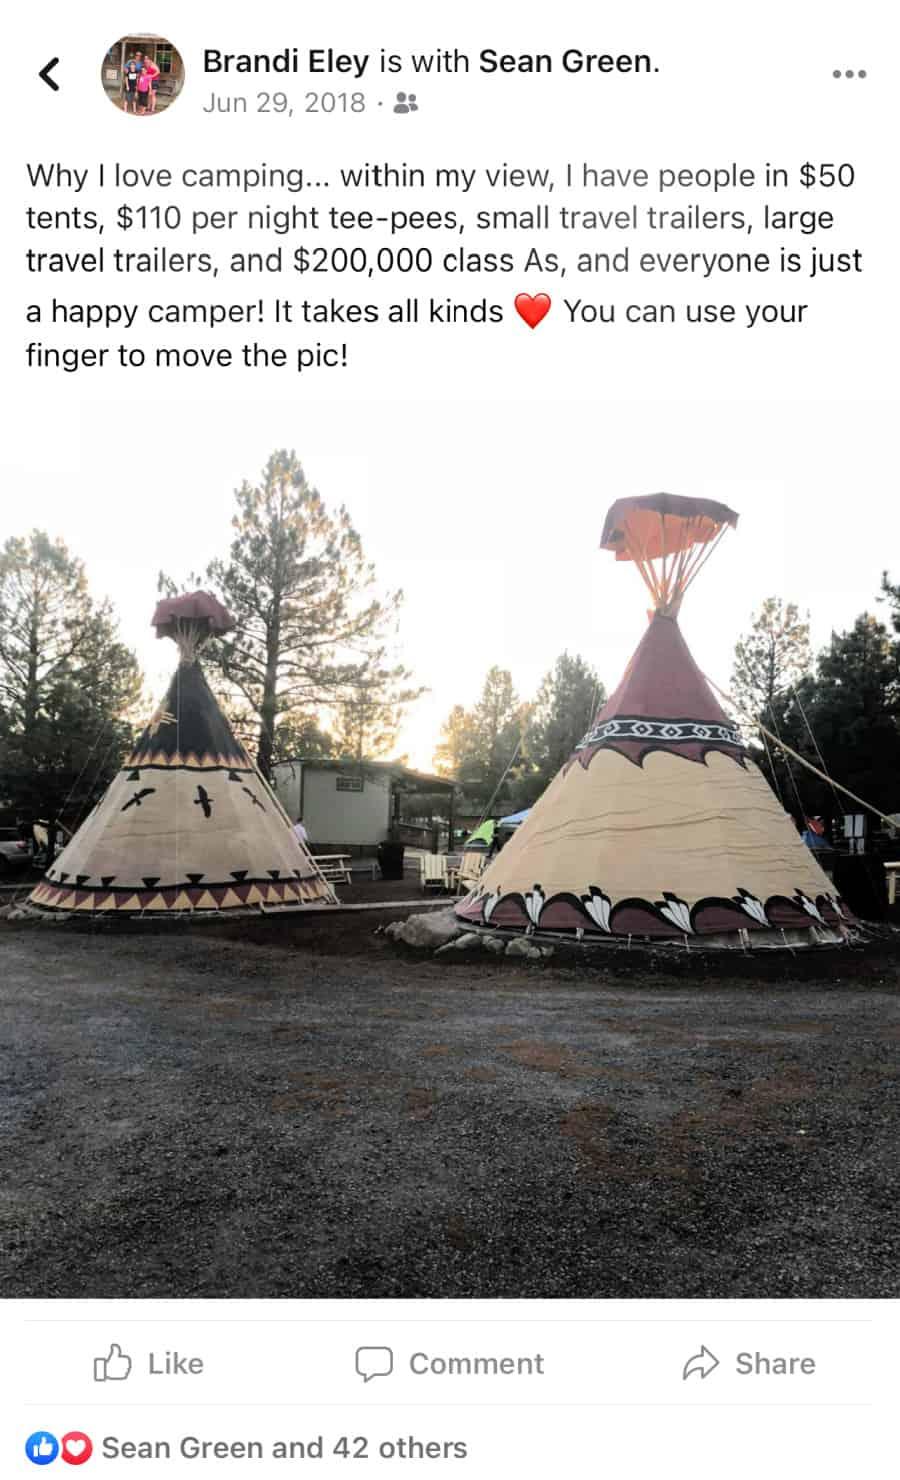 Campground Williams, Arizona